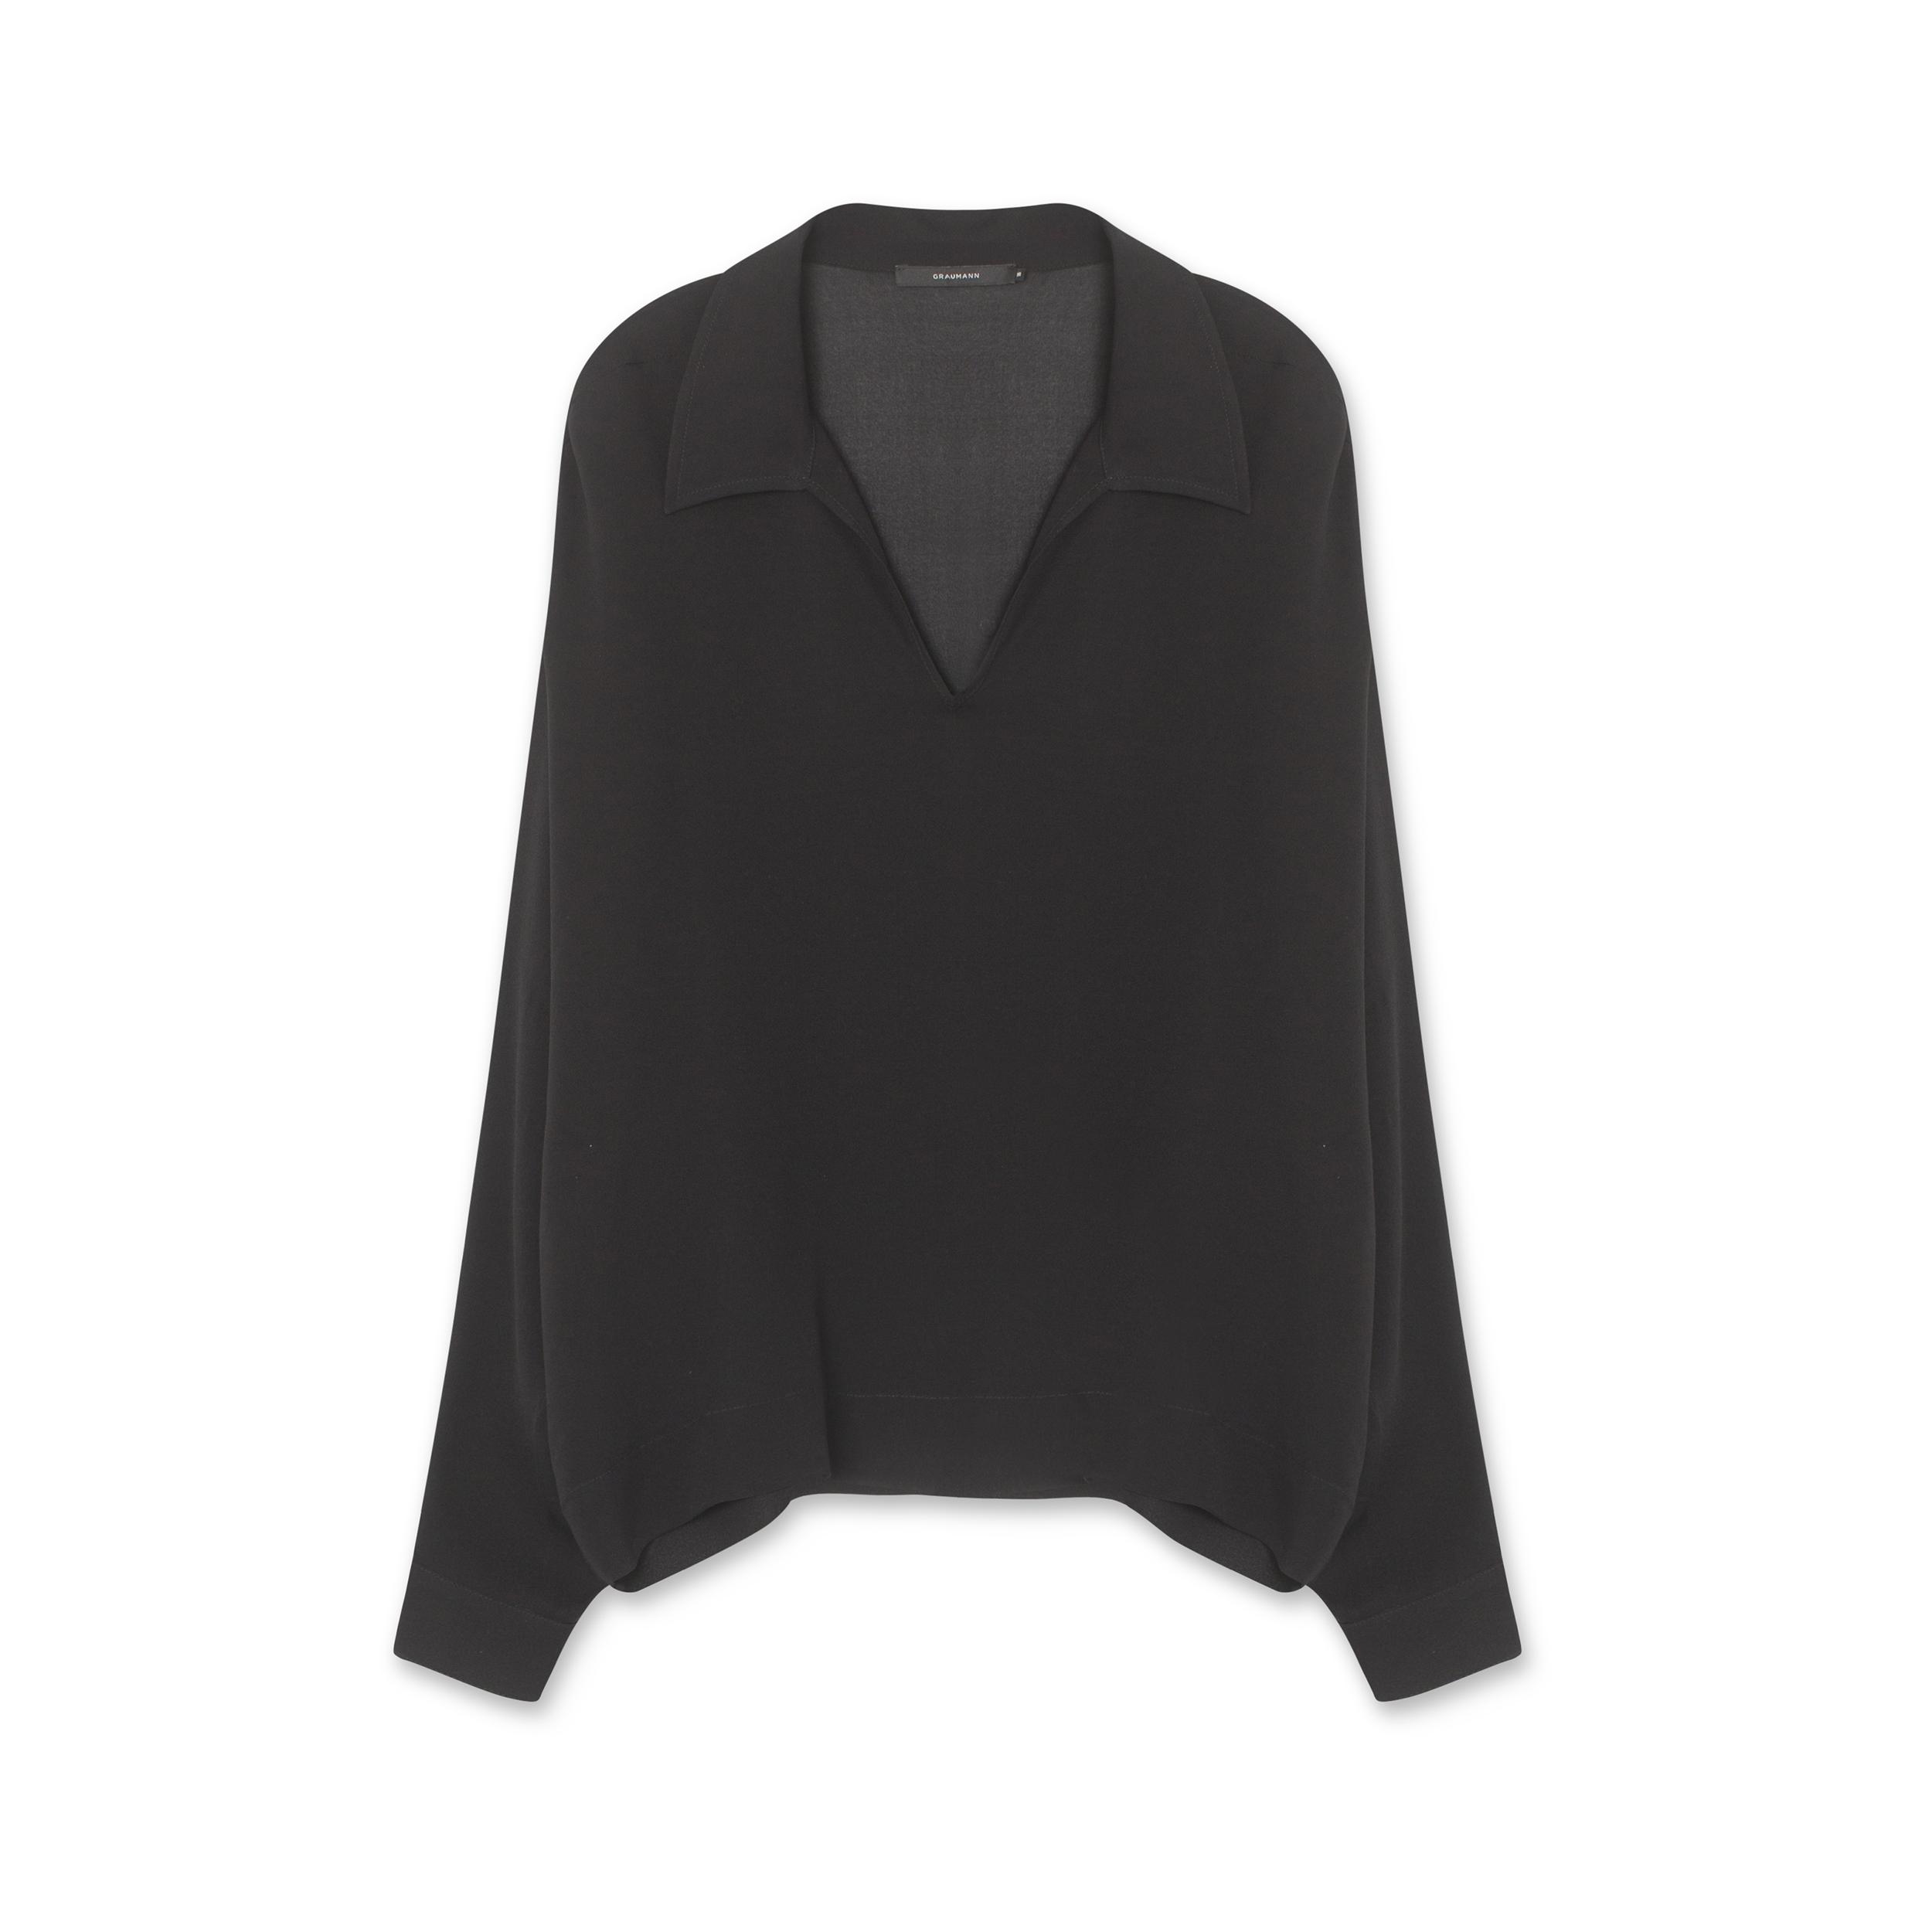 Graumann Alice Shirt Black